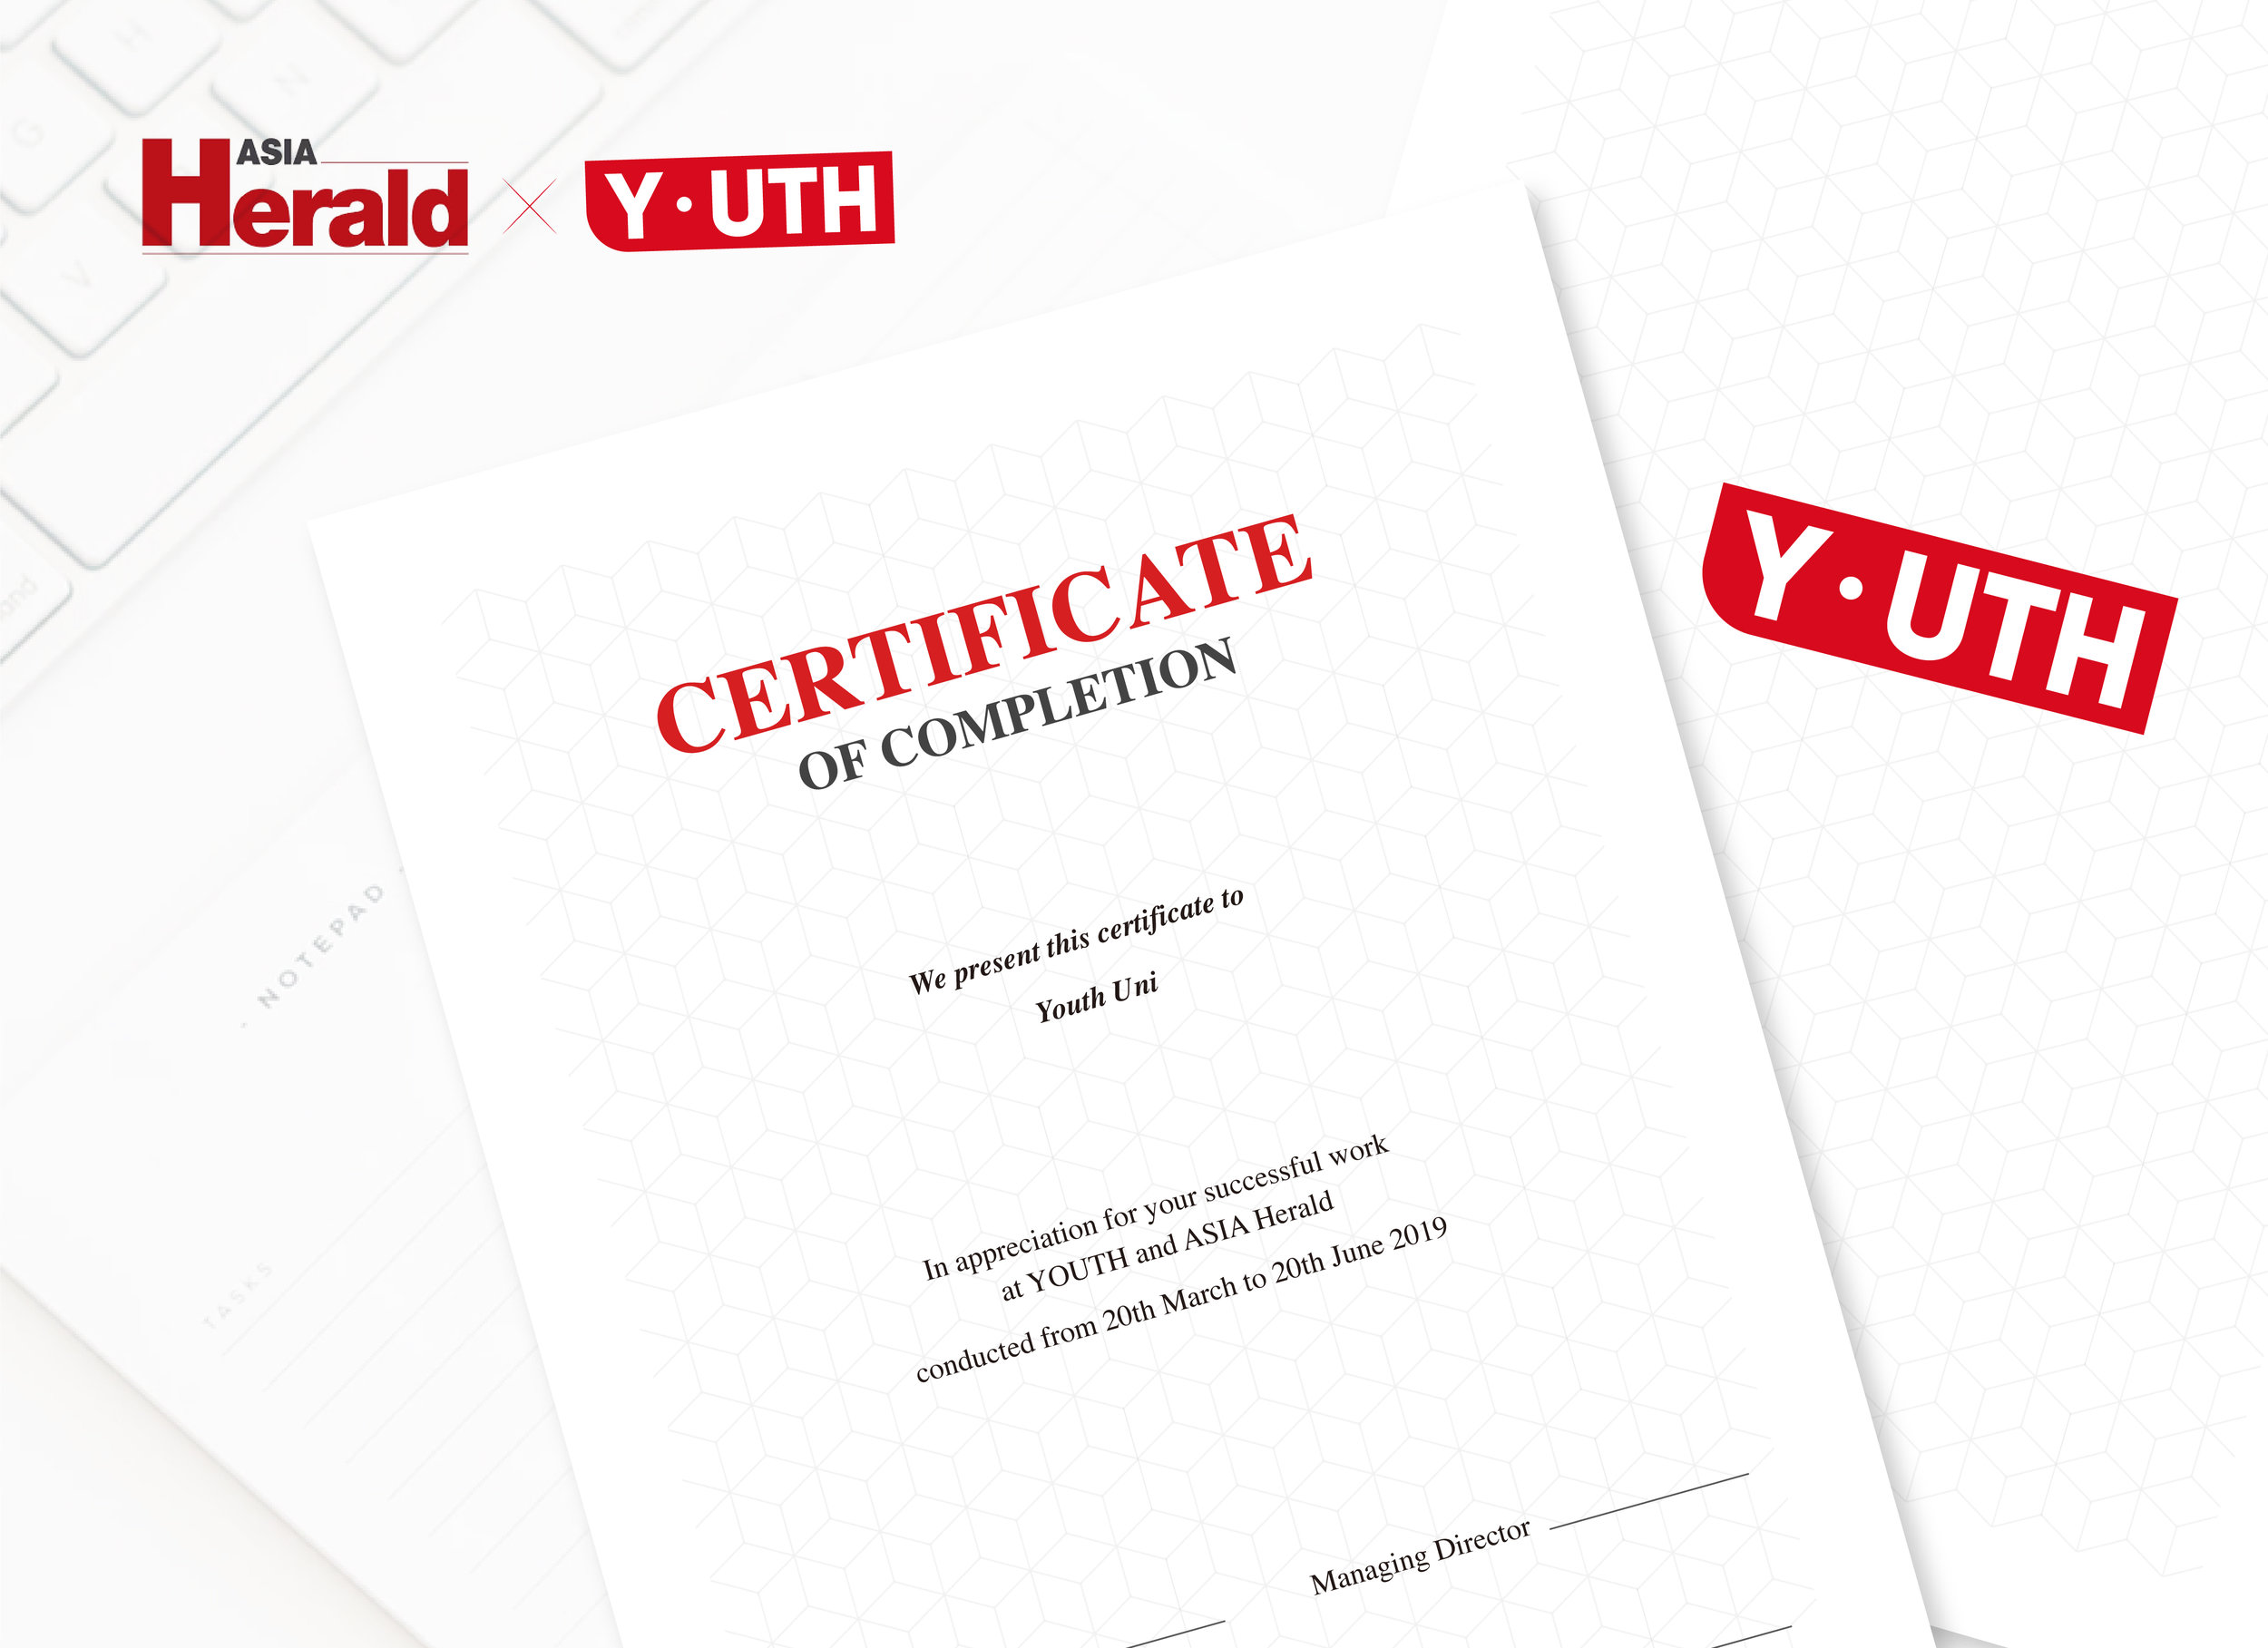 youthcreater-01.jpg